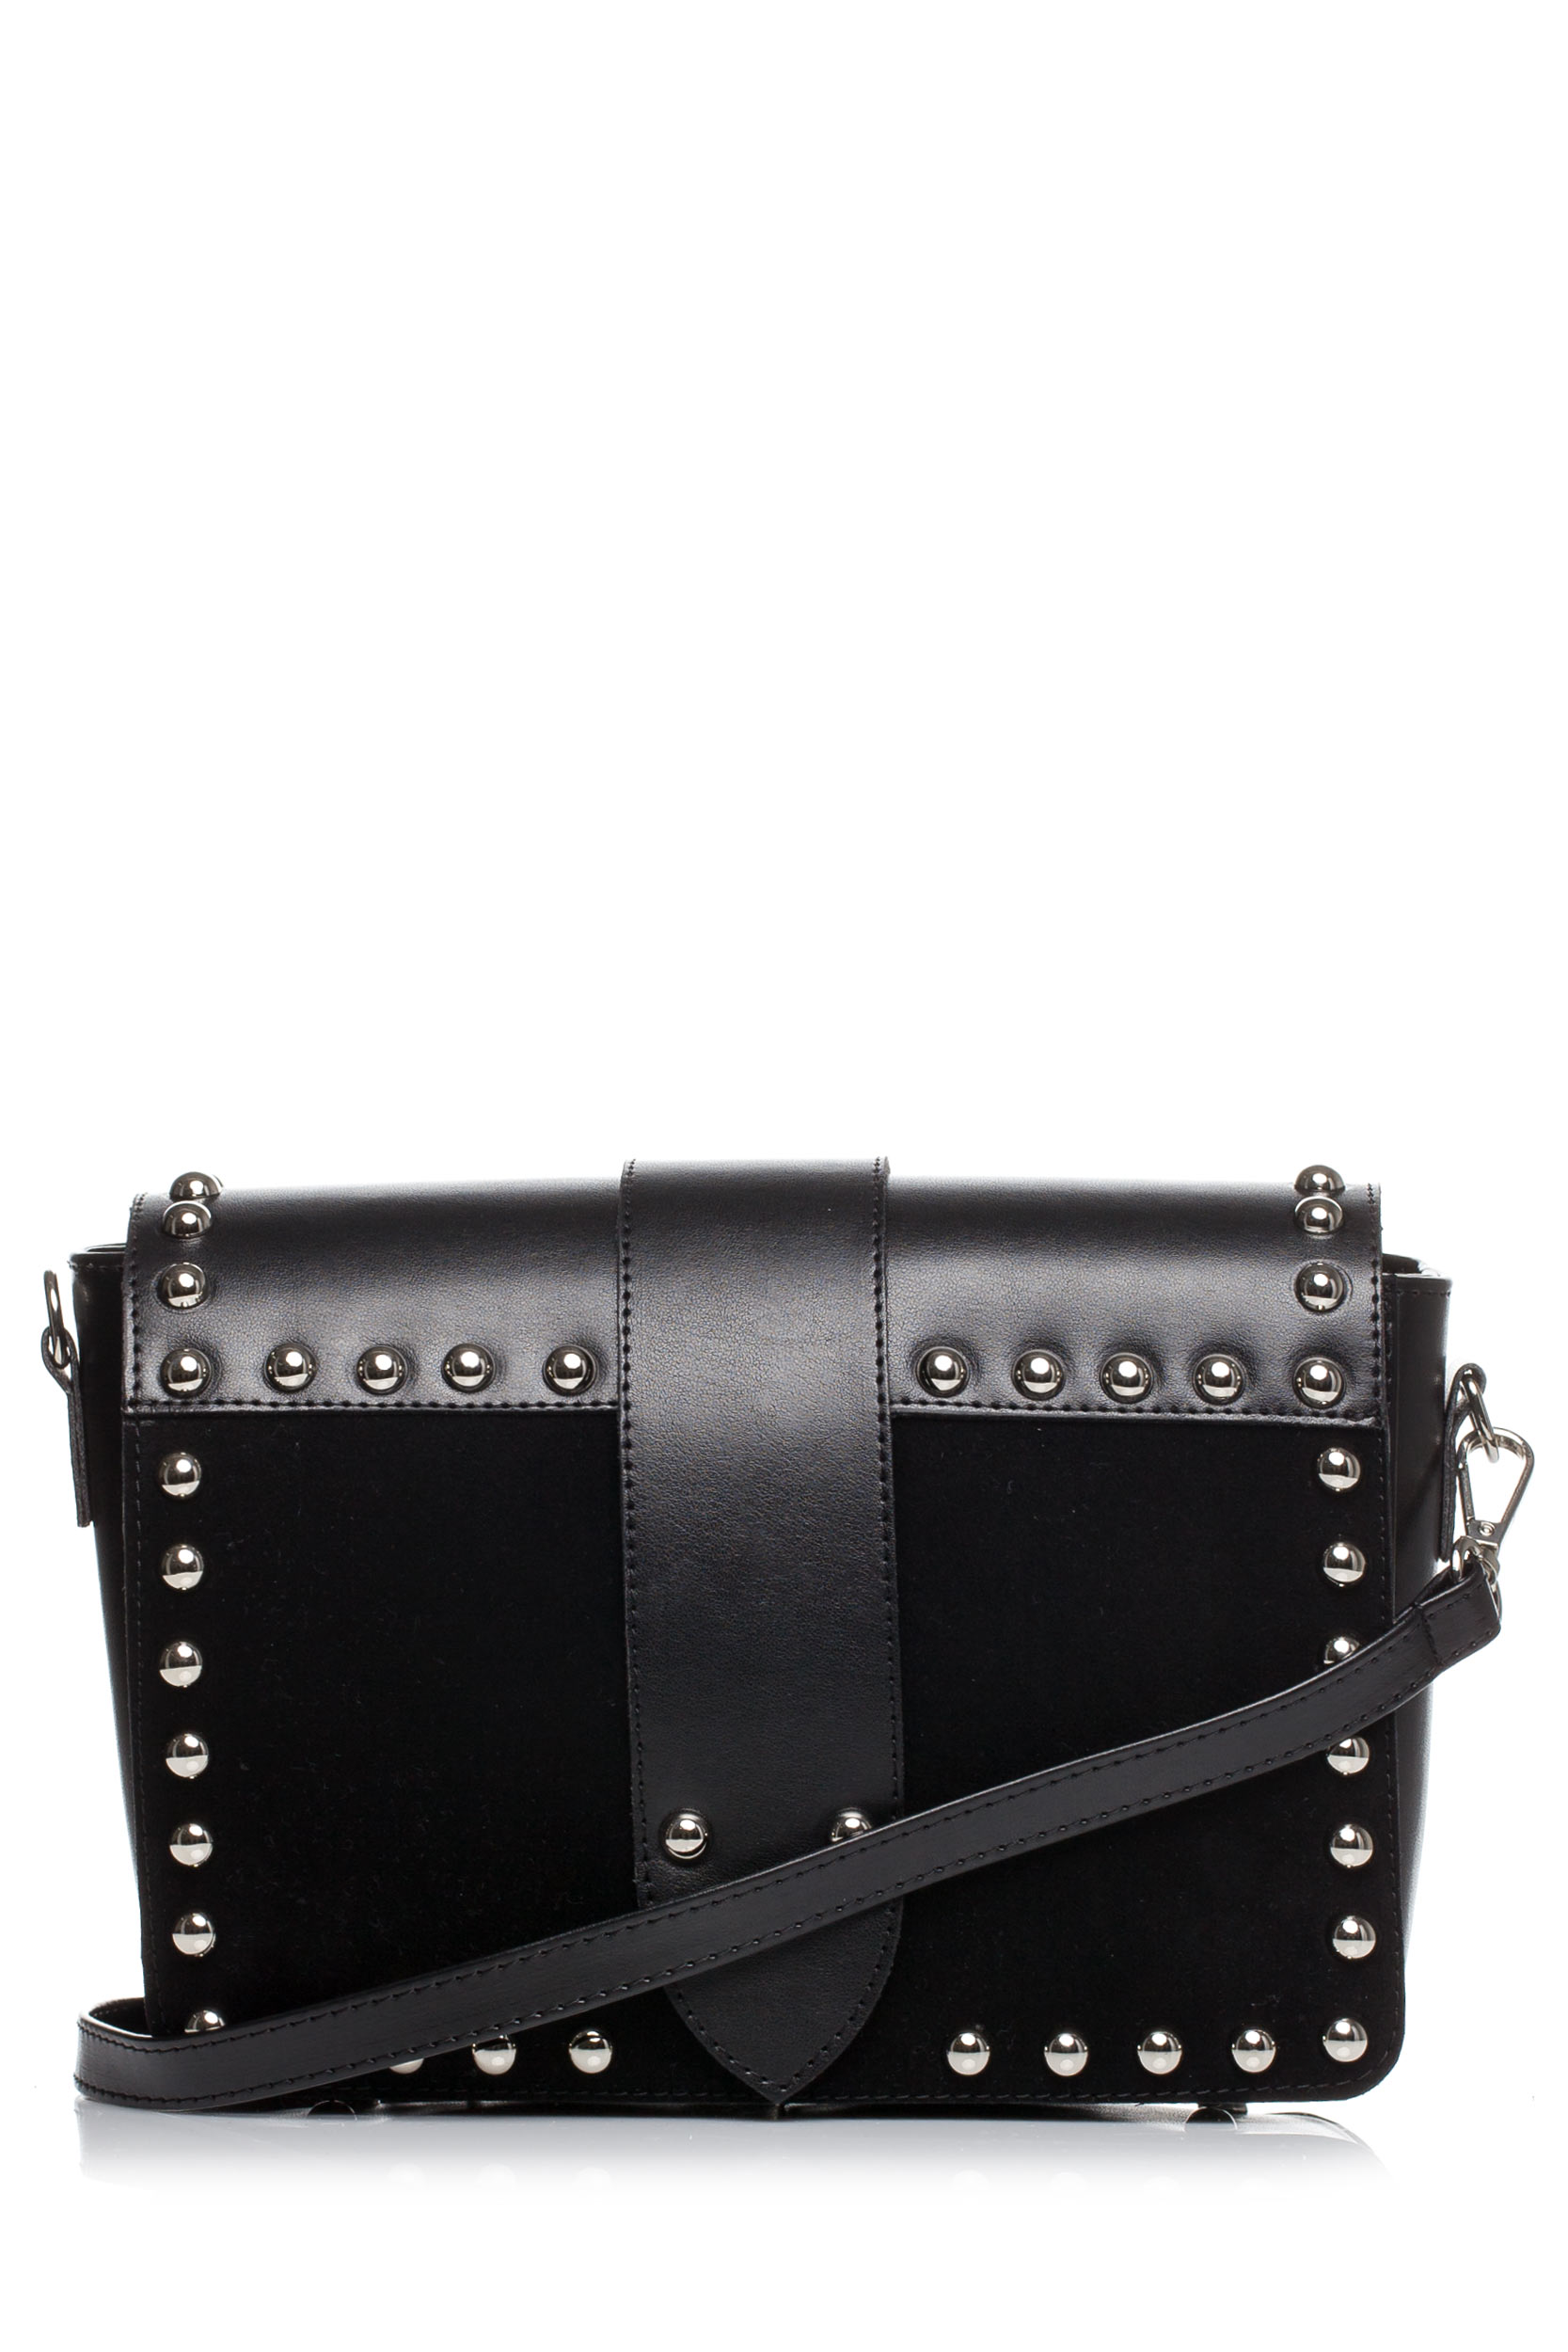 CM3575 Damska torebka z ozdobnymi nitami - czarna